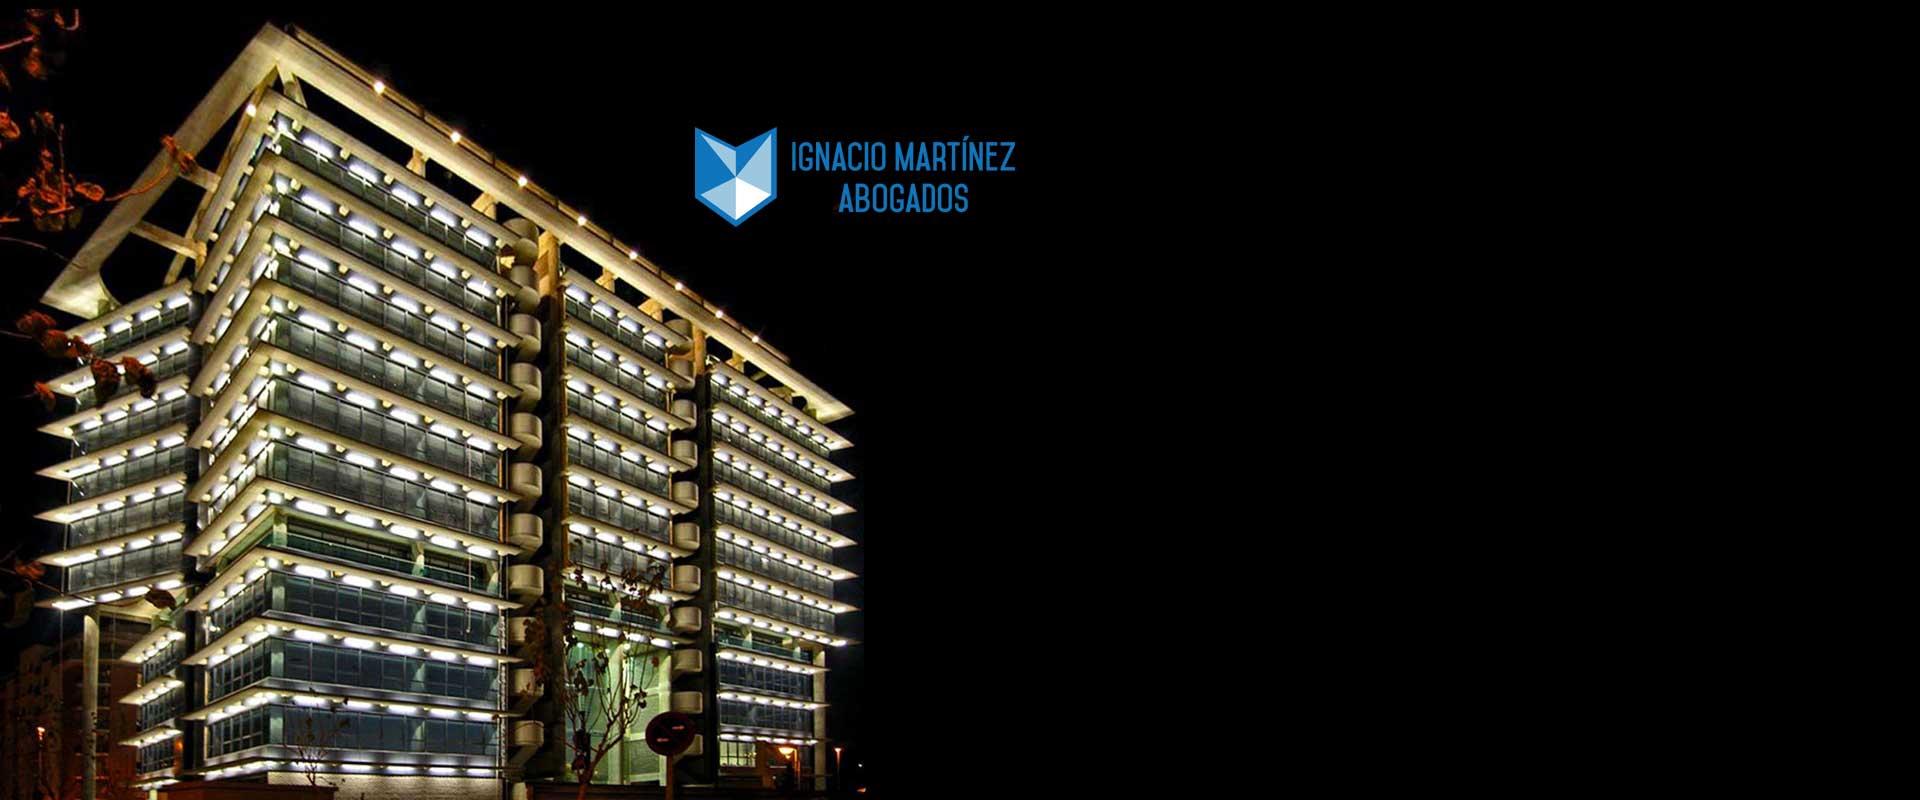 OFICINAS Ignacio martinez abogados